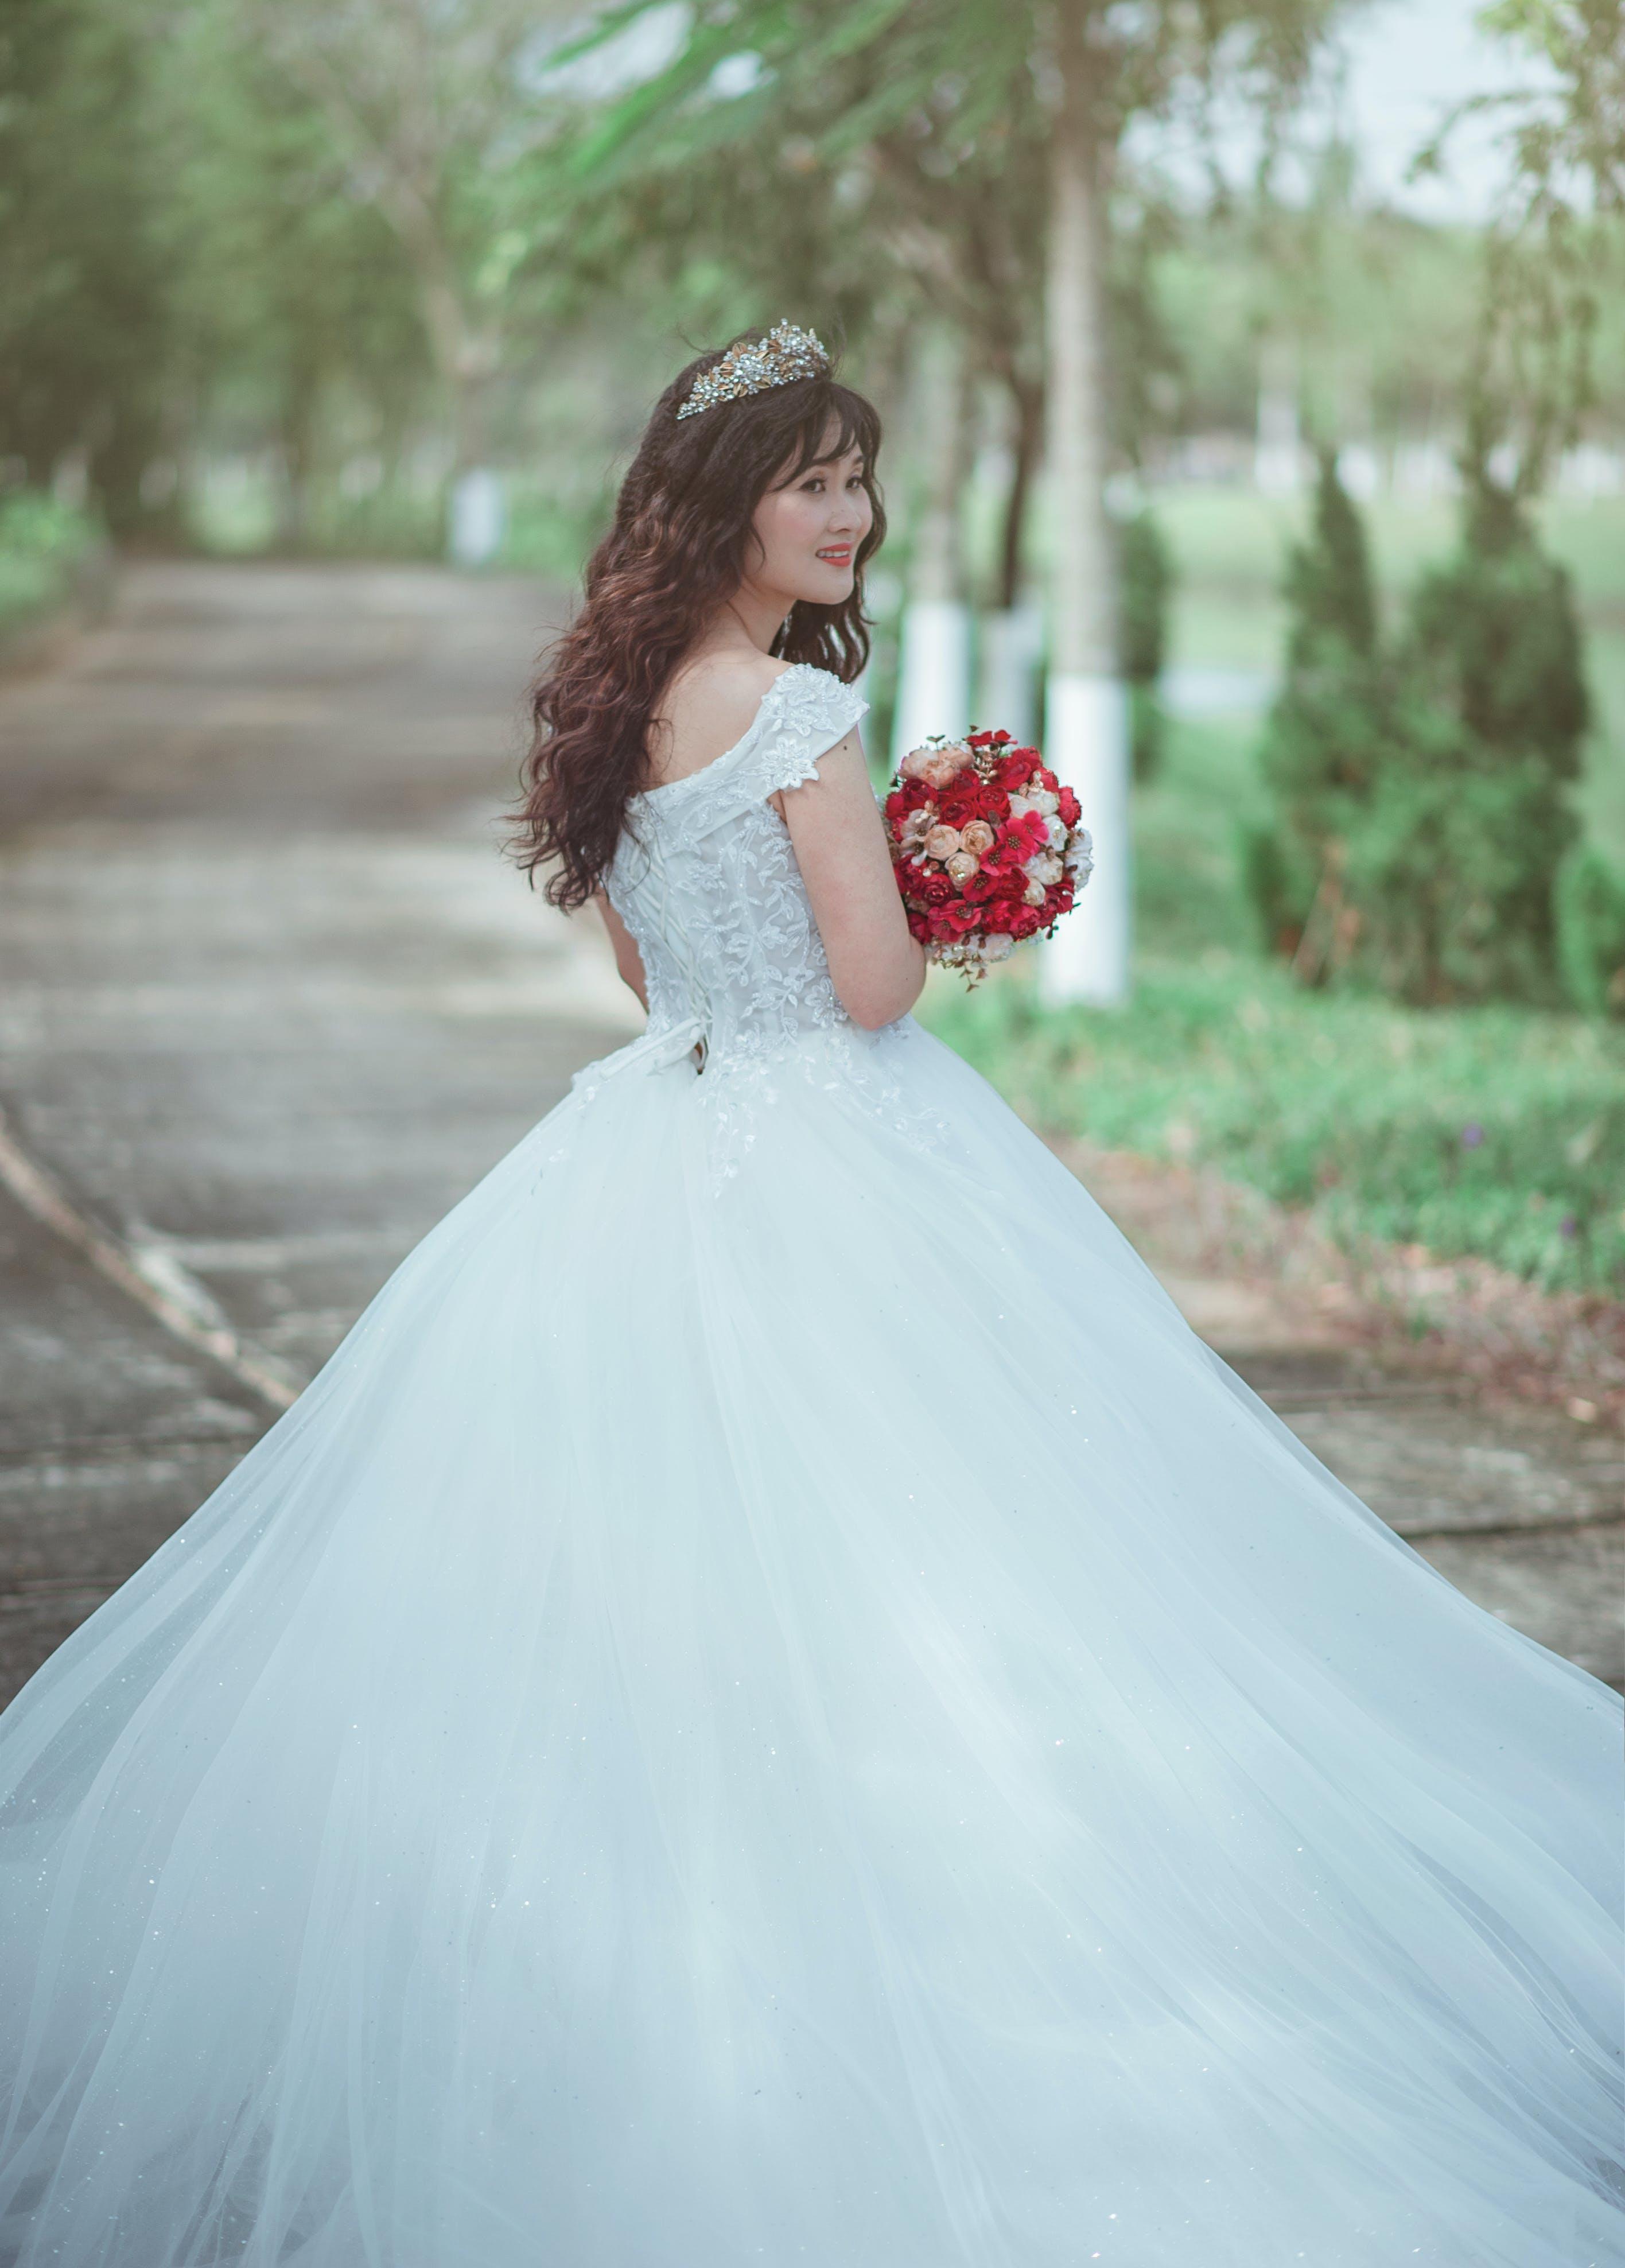 blomster, brud, brudekjole